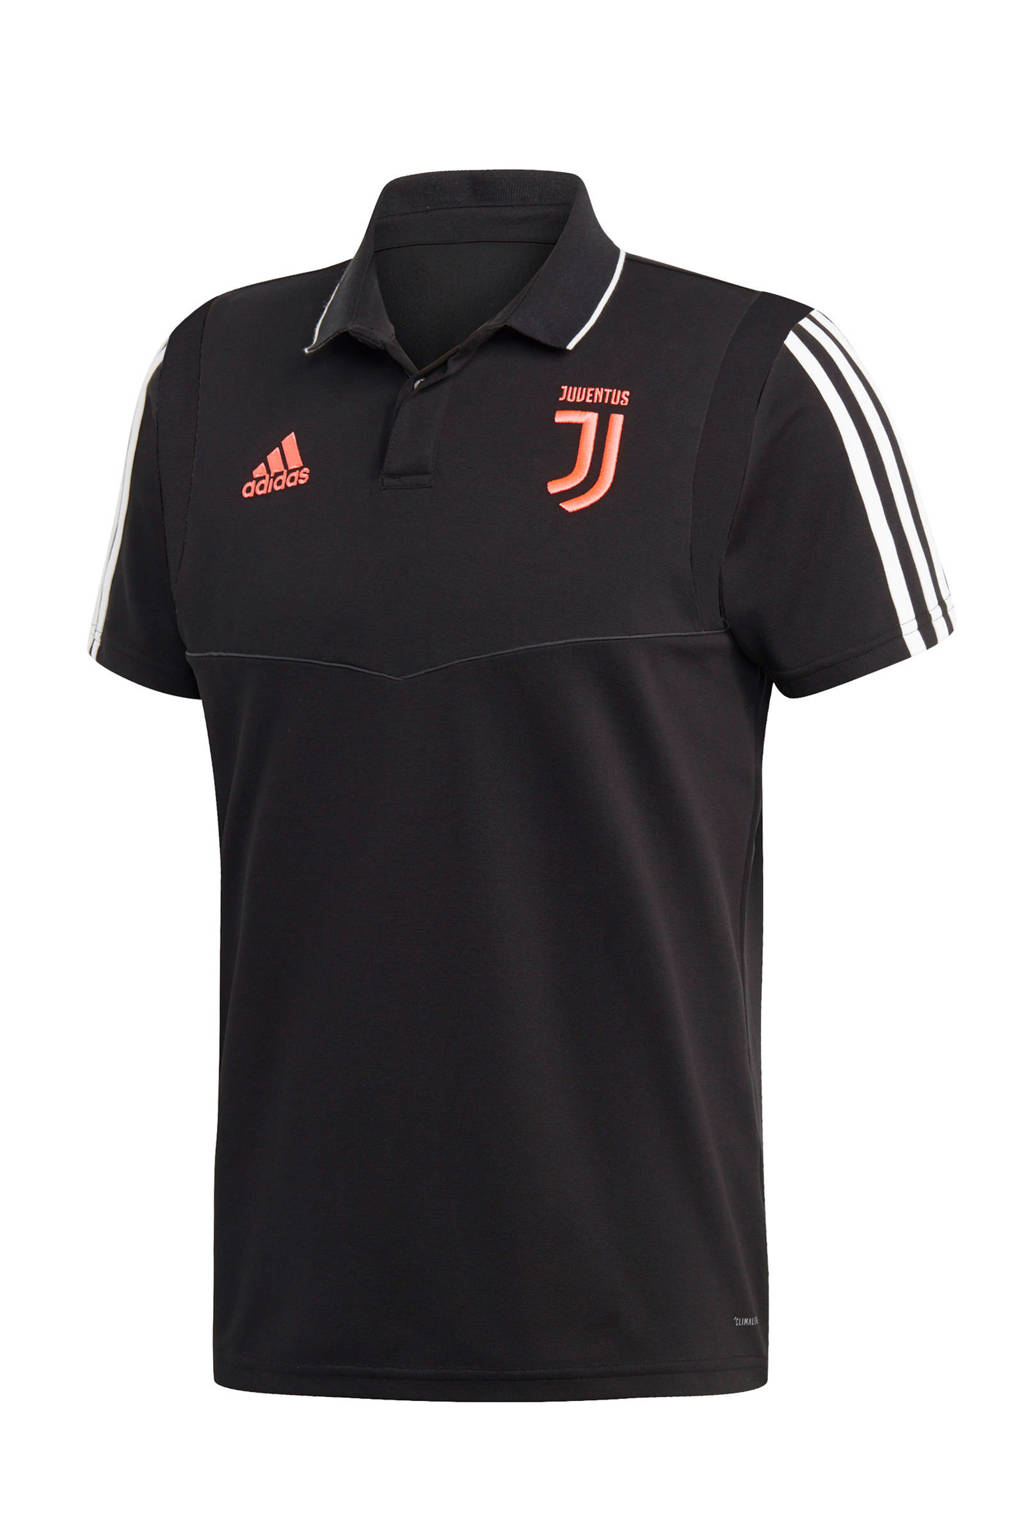 adidas performance Senior Juventus voetbalpolo zwart, Zwart/grijs